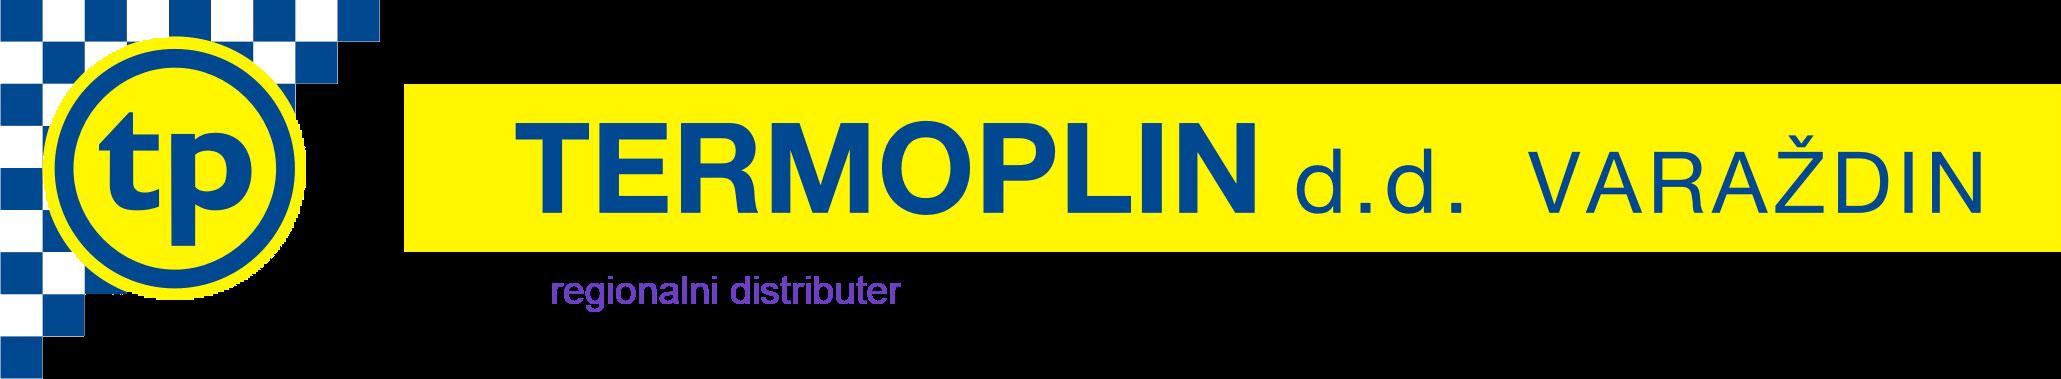 http://www.termoplin.com/